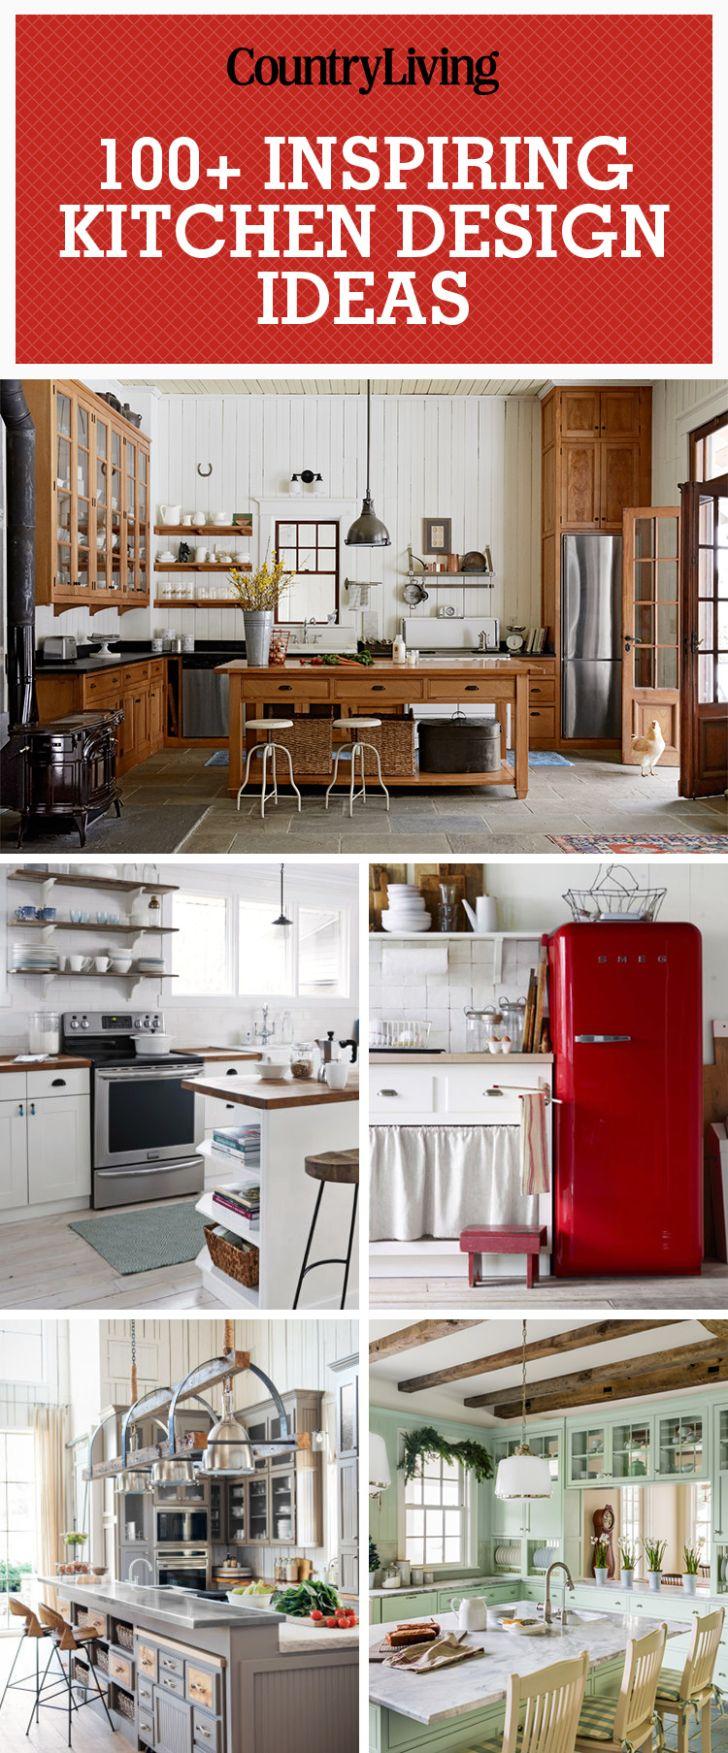 Kitchen Cabinets: Kitchen Design Ideas Country. Kitchen Design Ideas Of Country Decorating Photos Country Desktop High Resolution